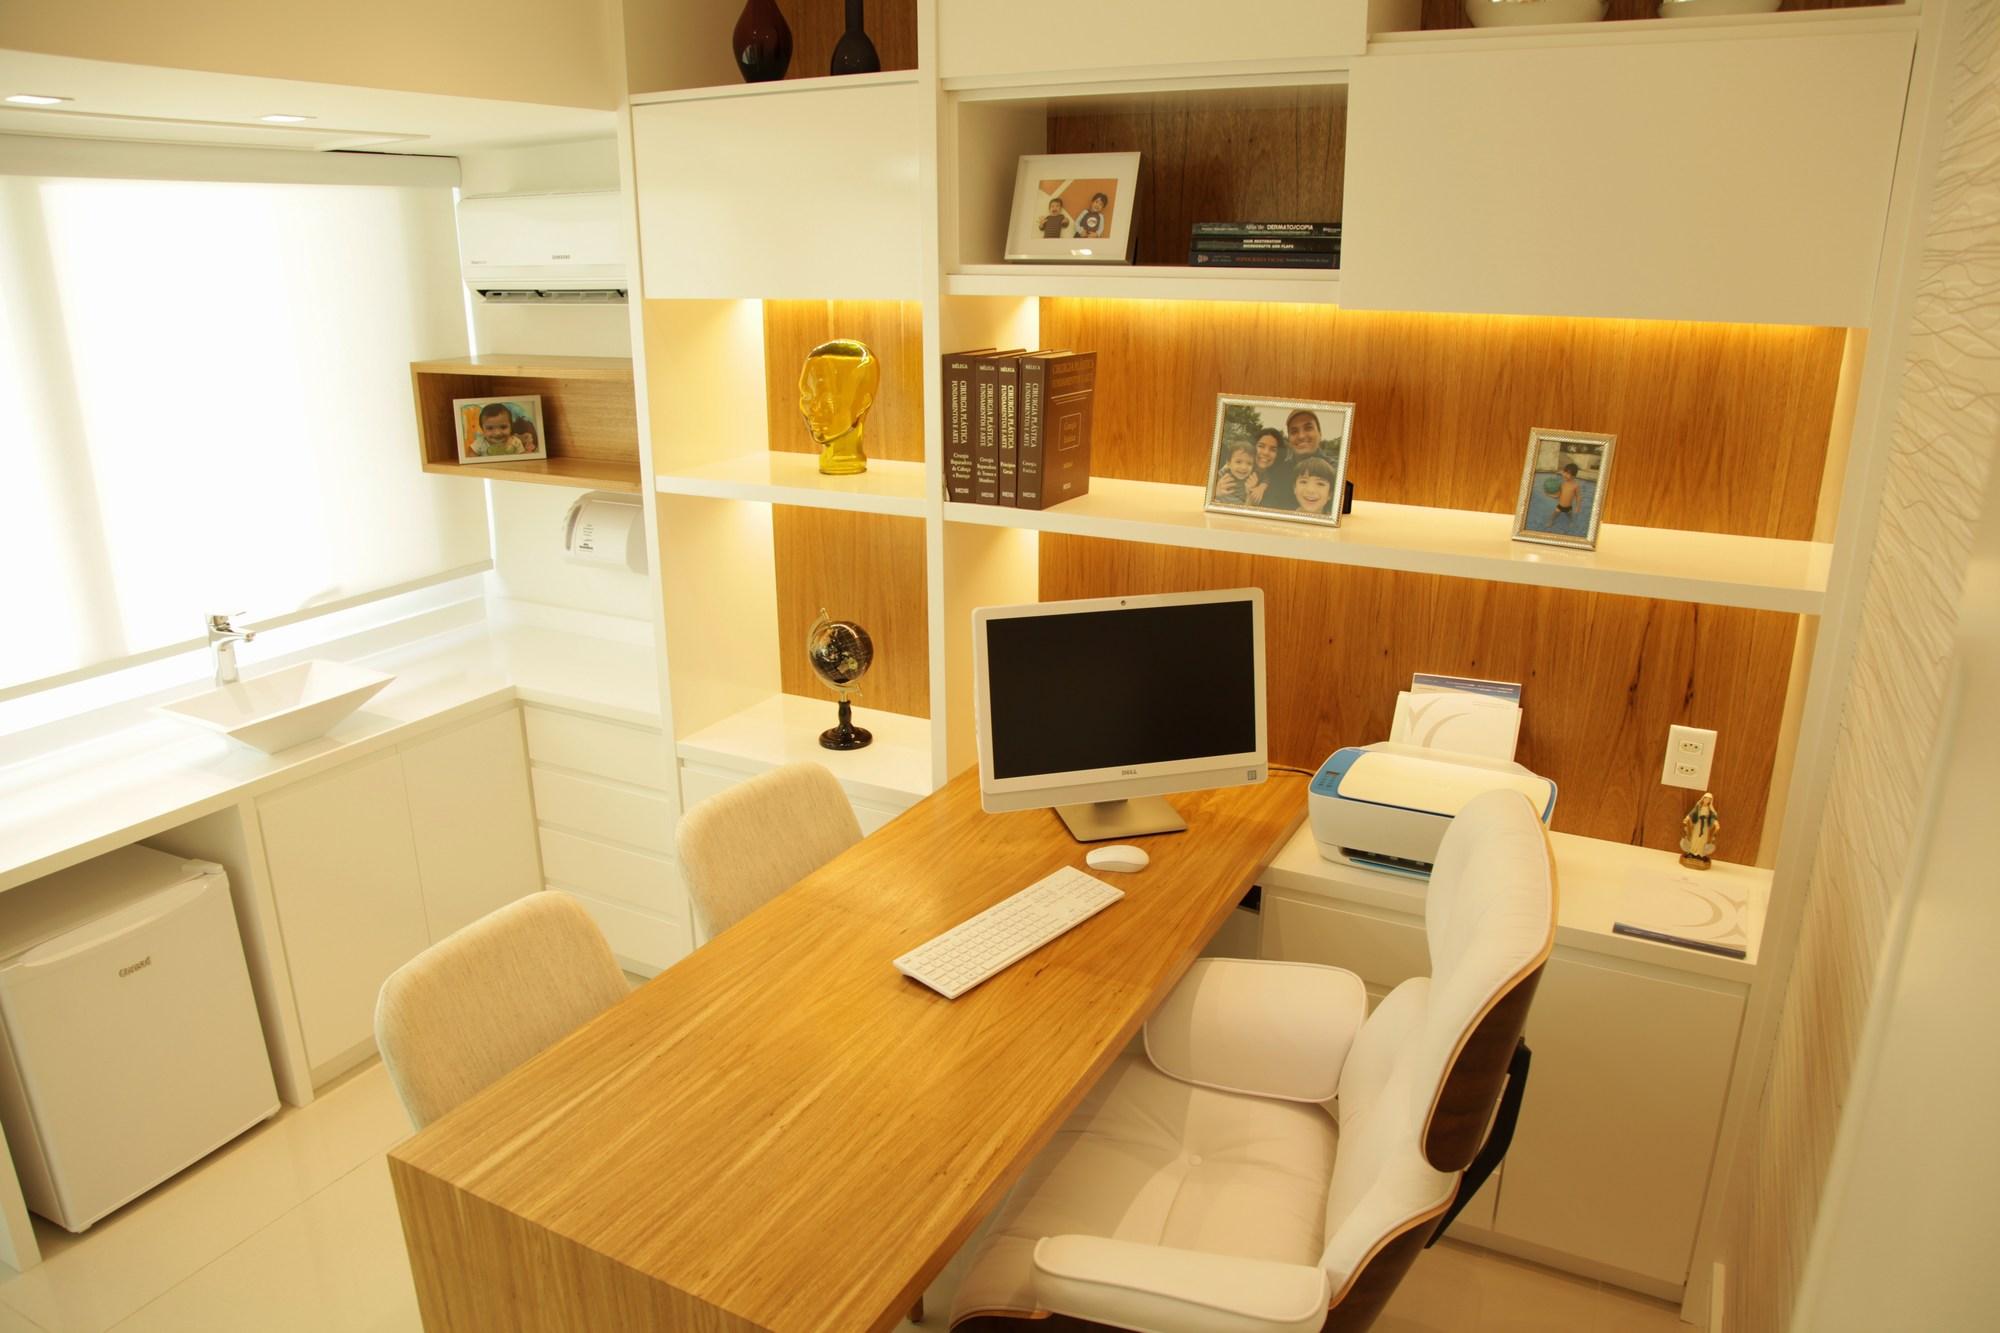 Fotografia de Interiores, Ambientes